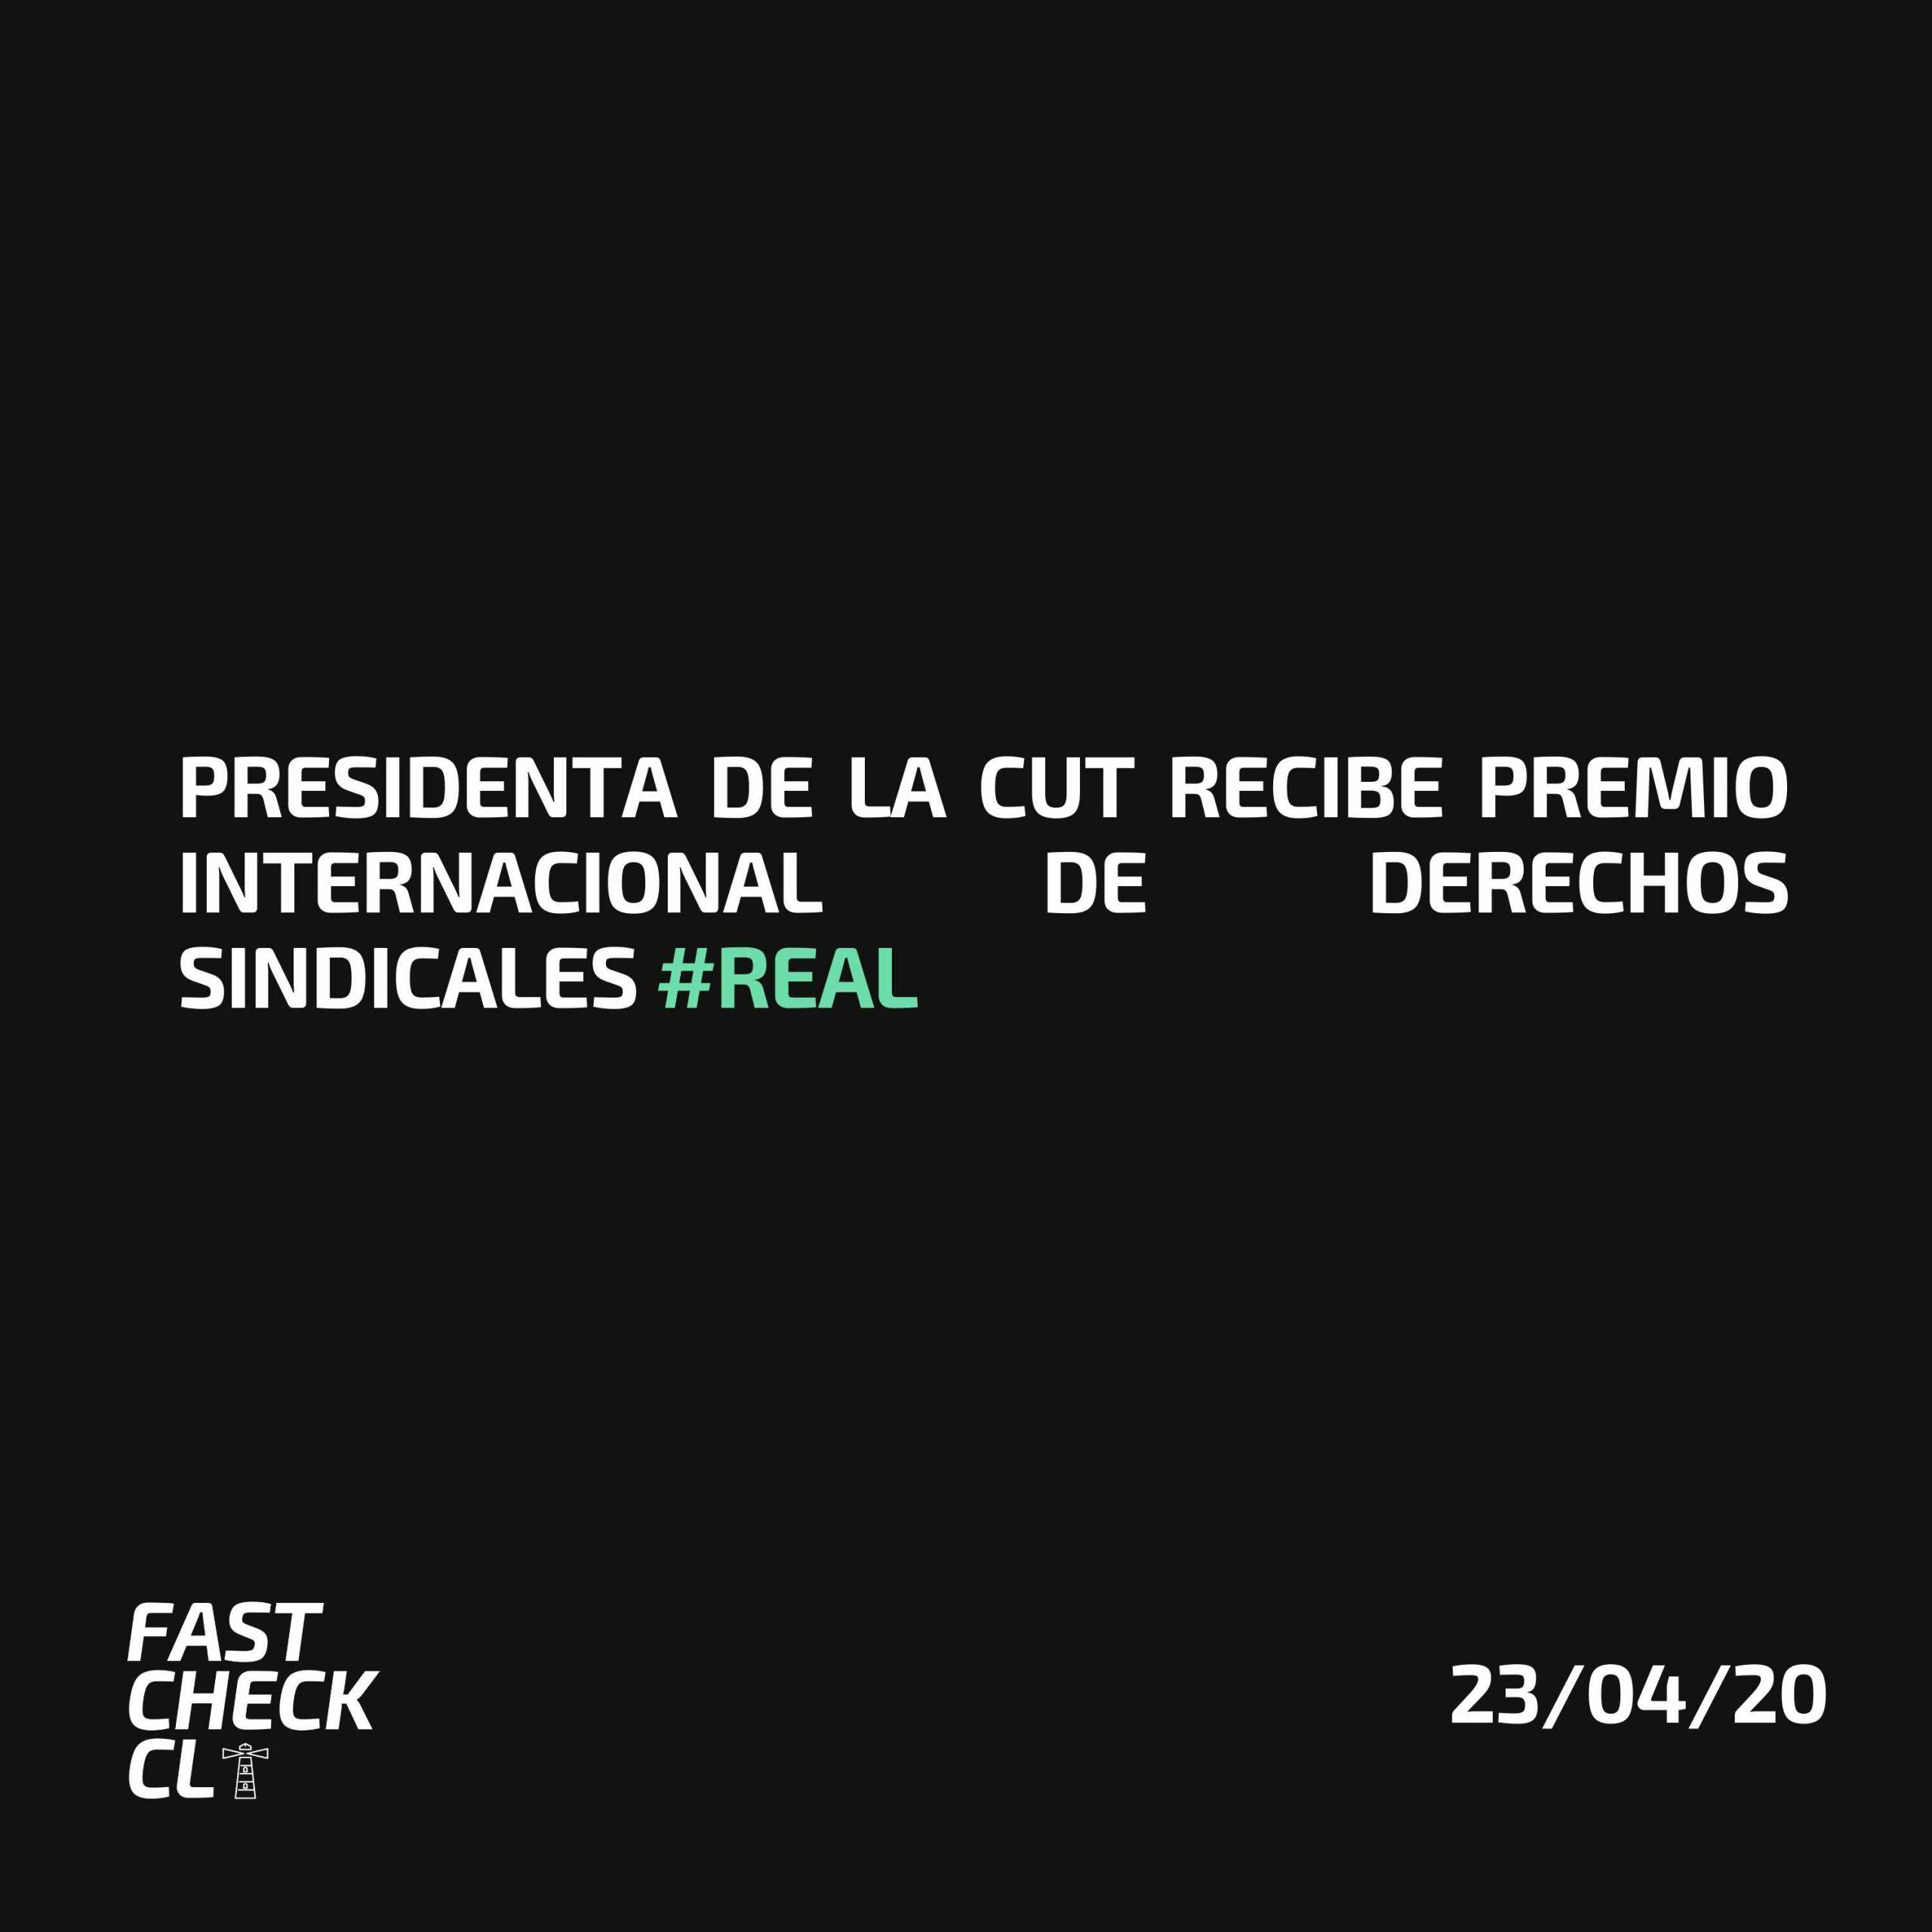 www.fastcheck.cl